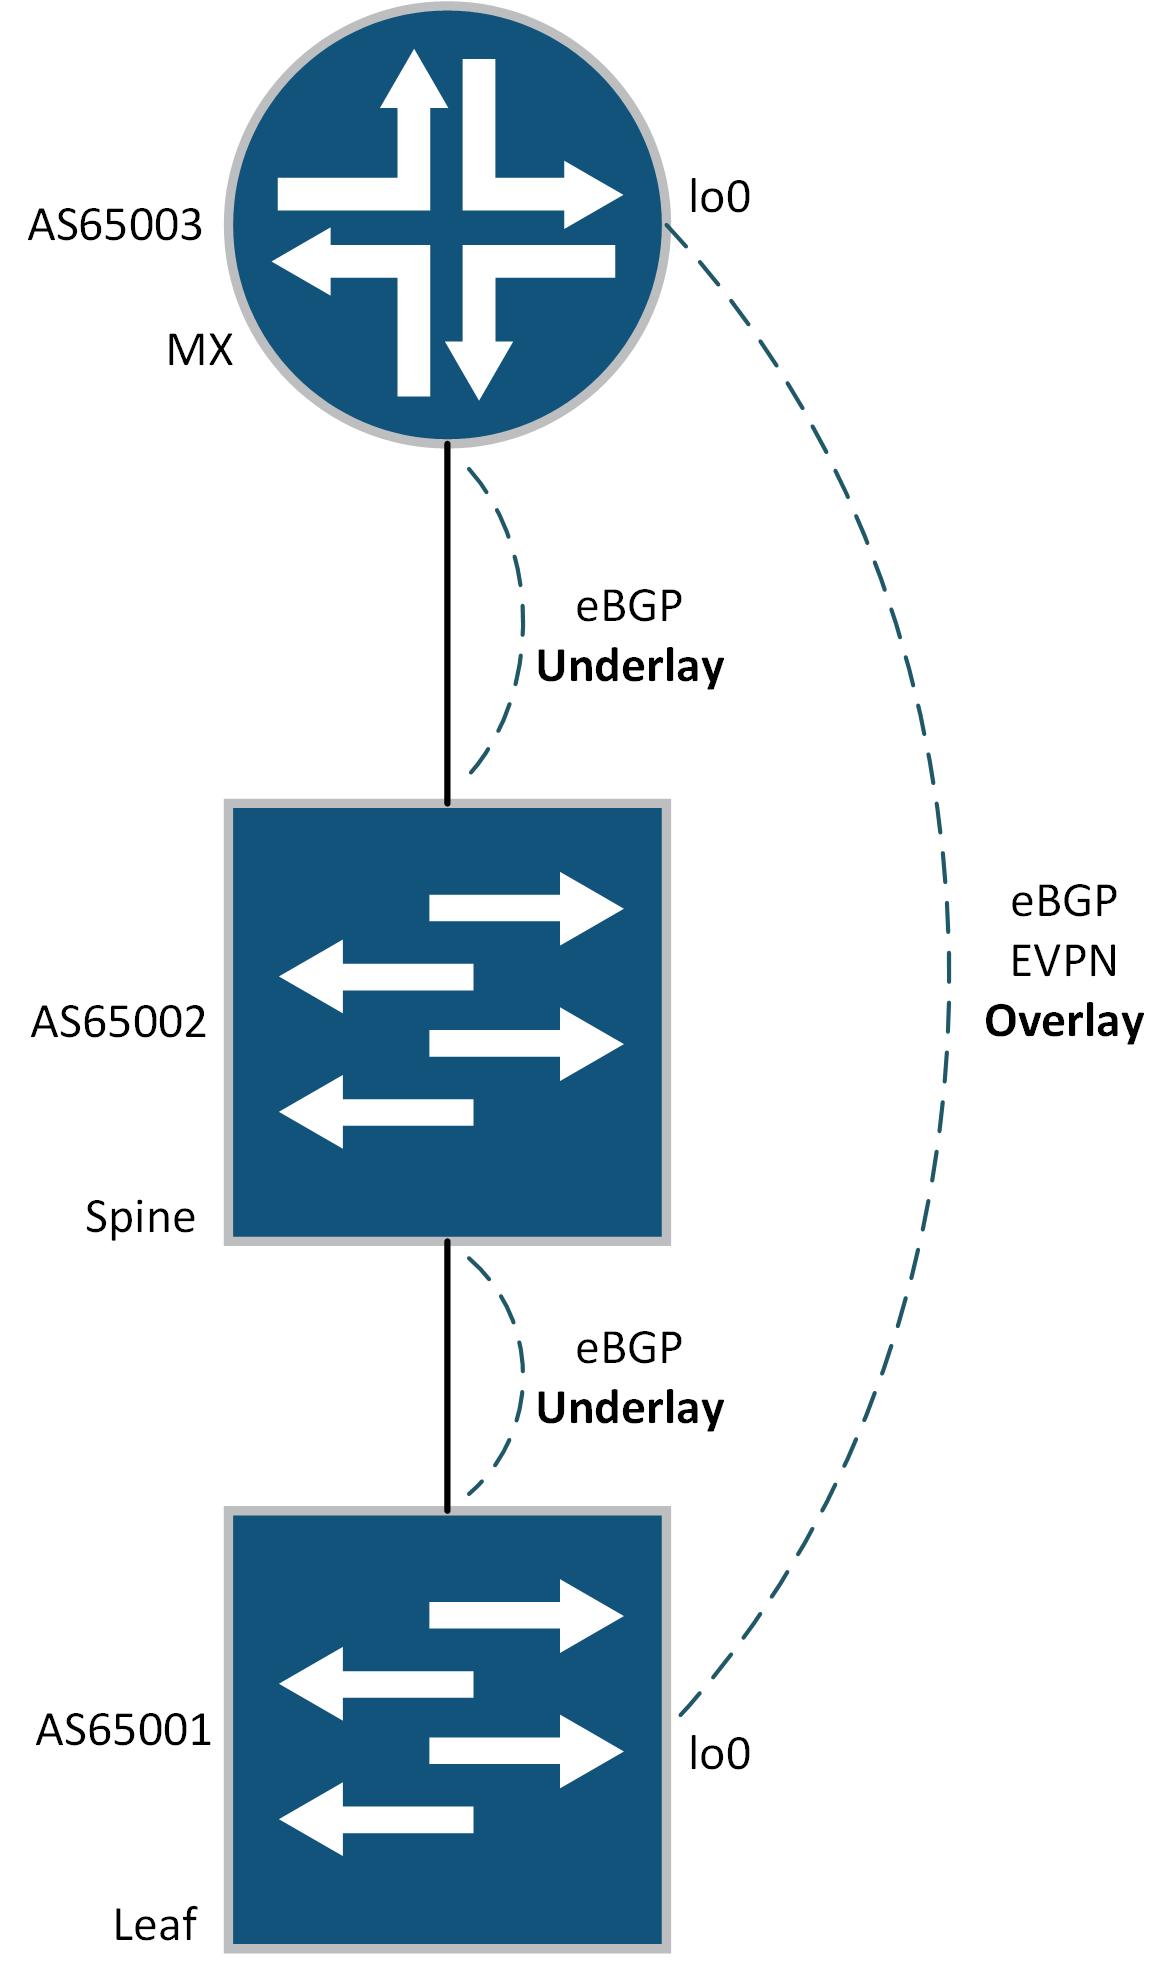 EVPN-VXLAN INTER-TENANT ROUTING ON JUNIPER QFX / MX - iNETZERO